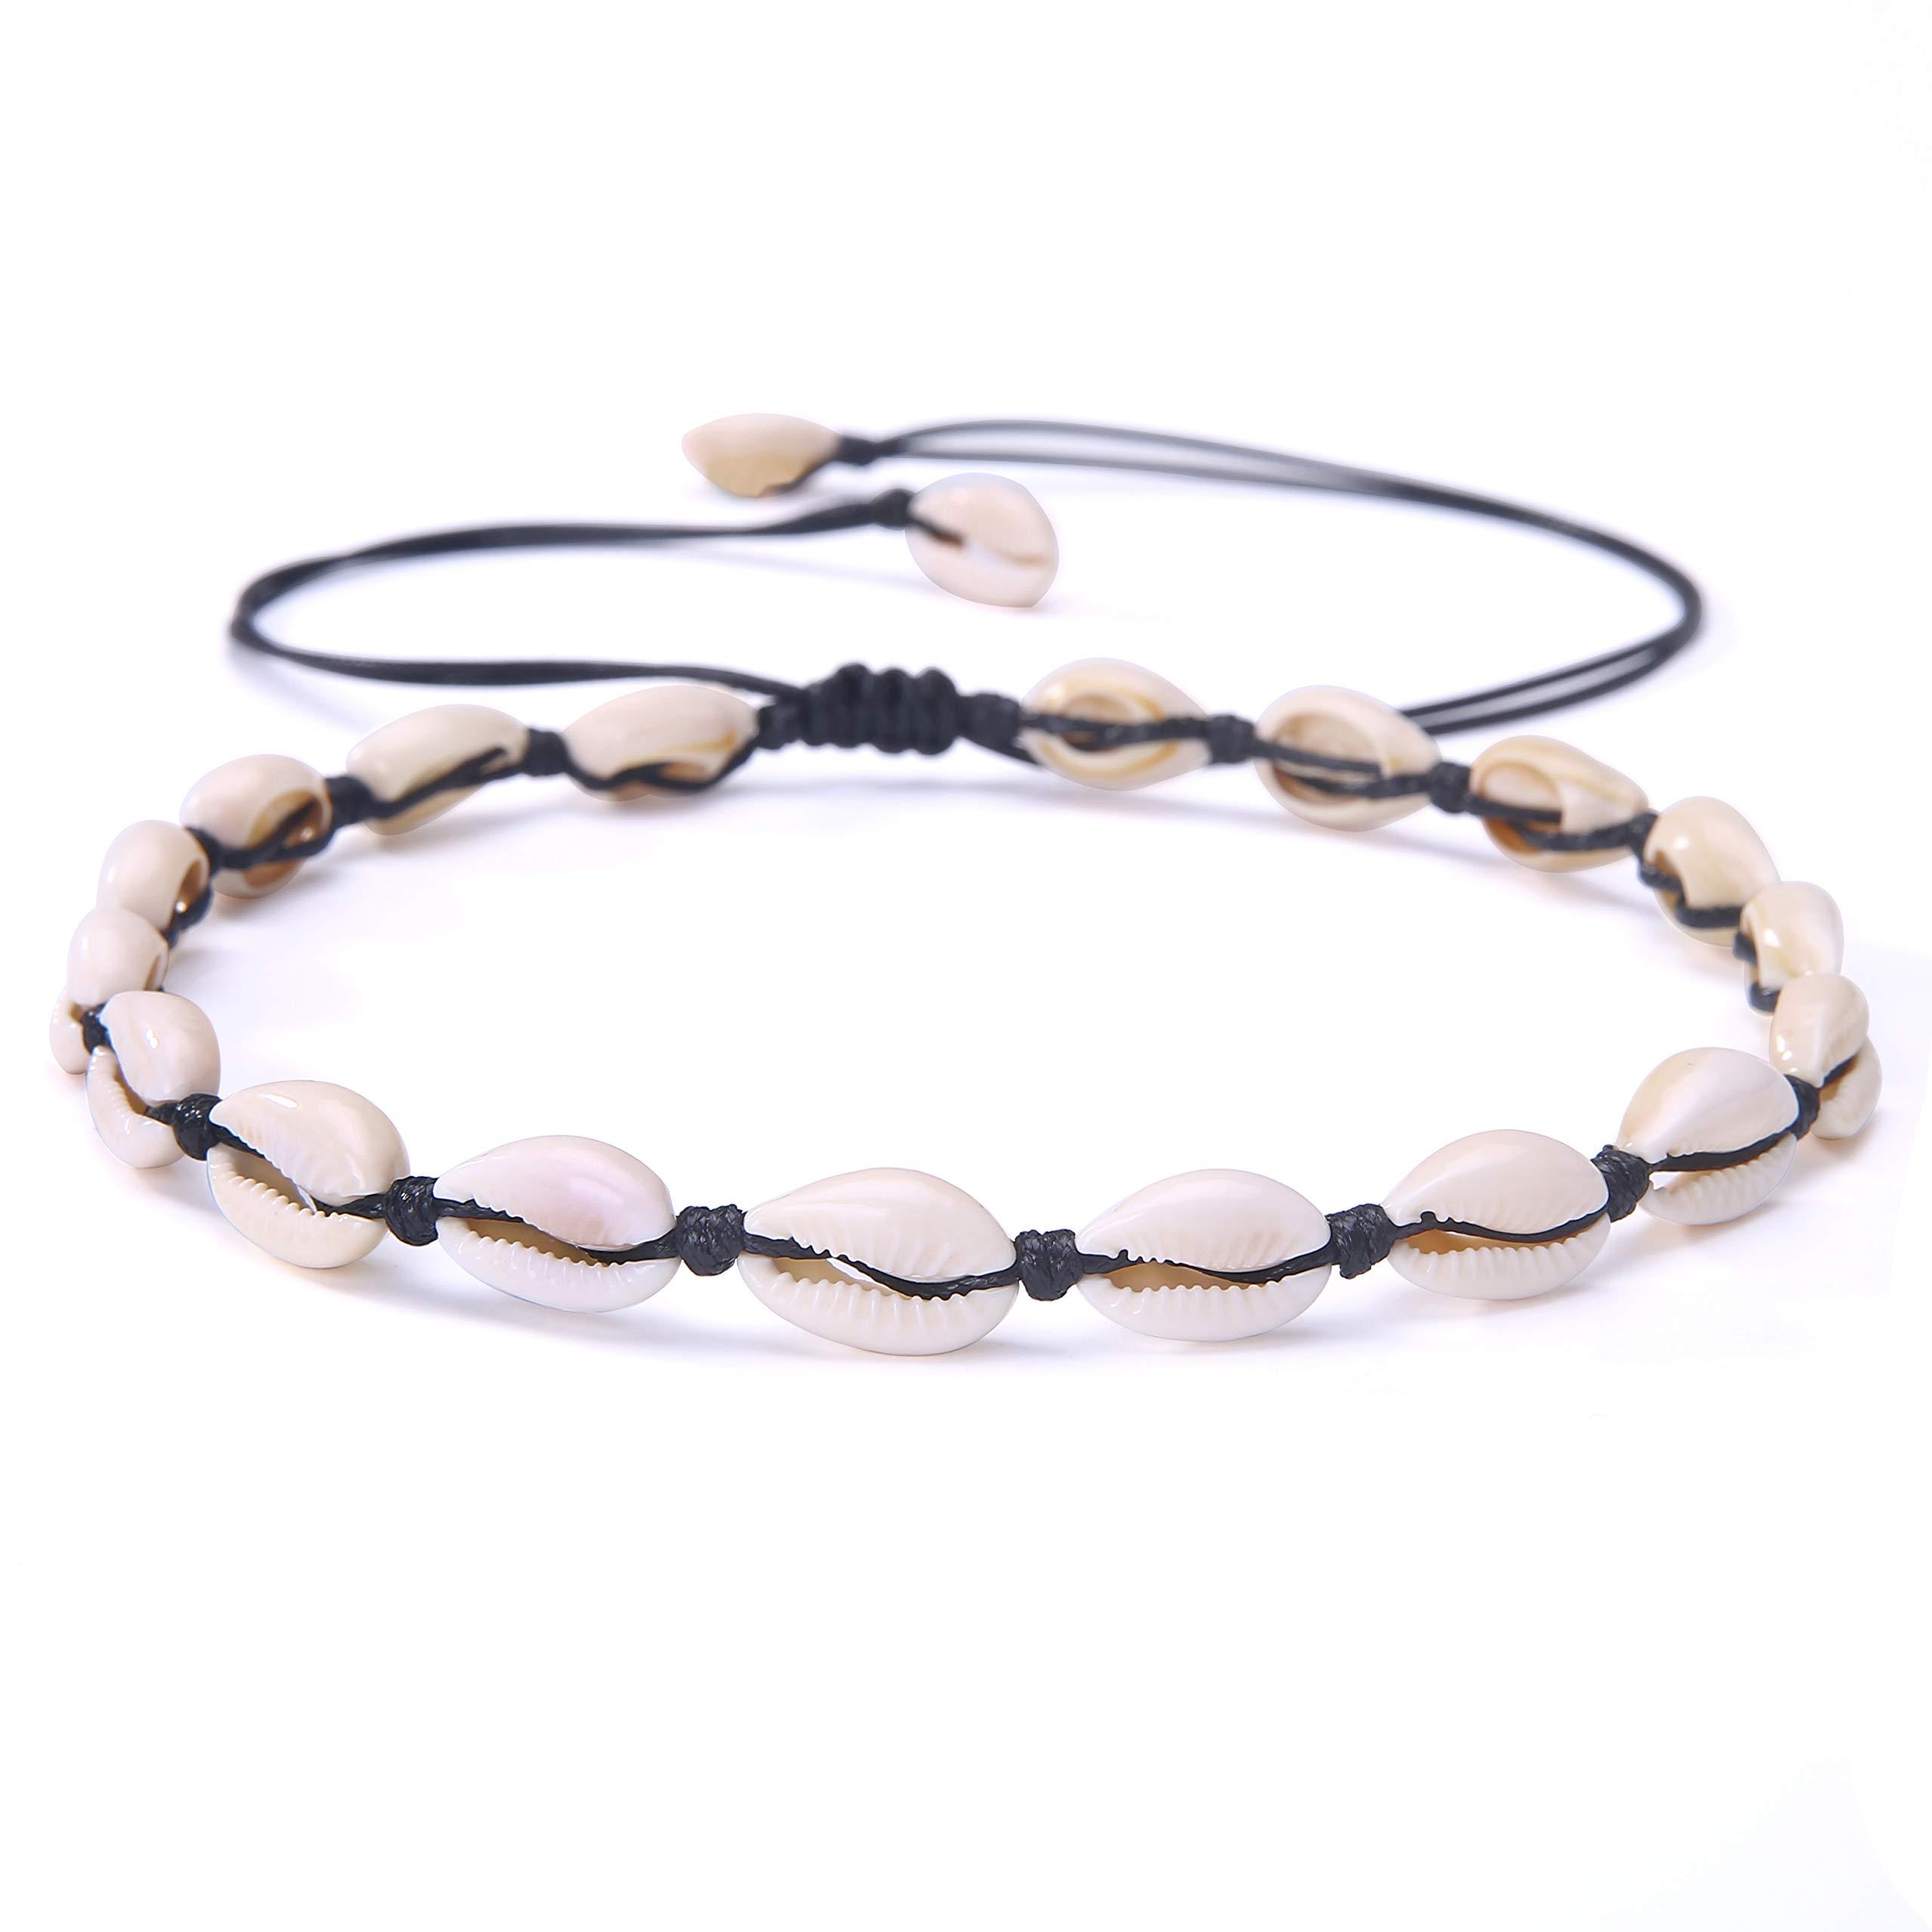 Natural Shell Choker Necklace Adjustable Hawaii Wakiki Beach Beads Cowrie Handmade Pearl Boho Jewelry for Women Girls